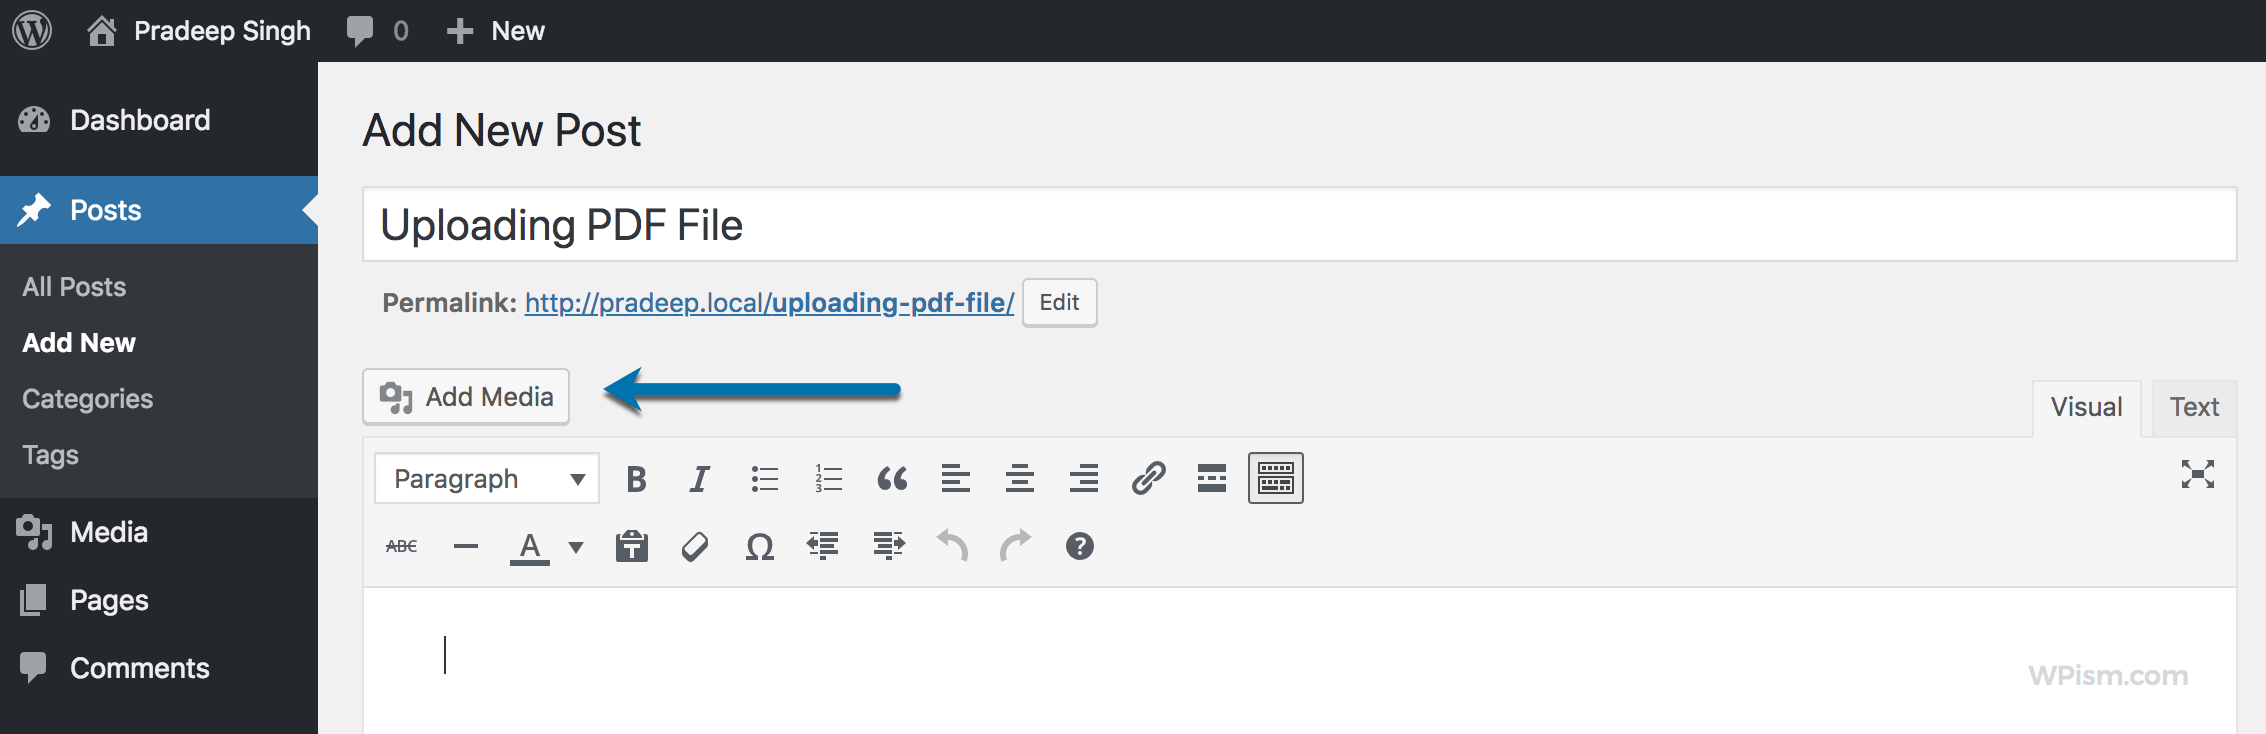 Click Add Media to Upload PDF File